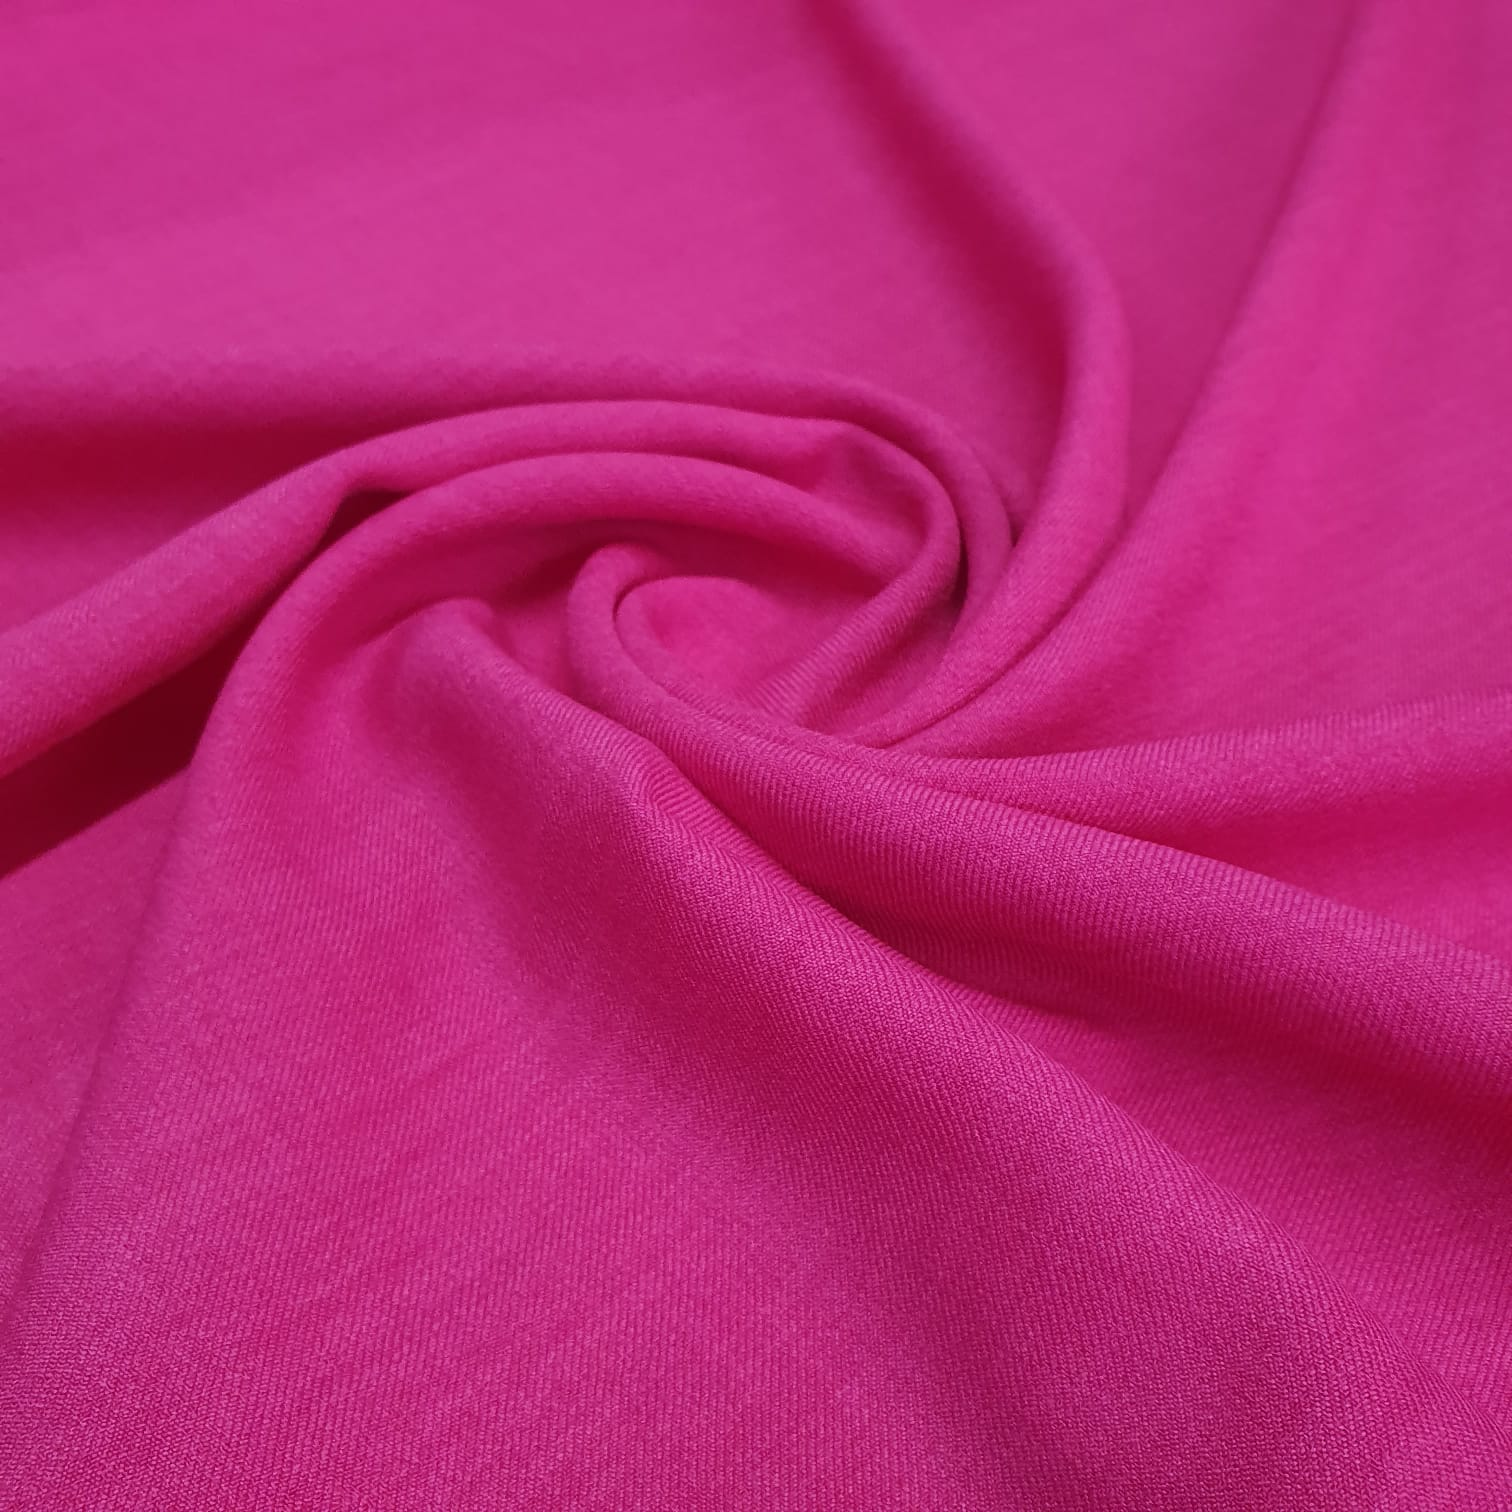 Linho Poliéster Pink